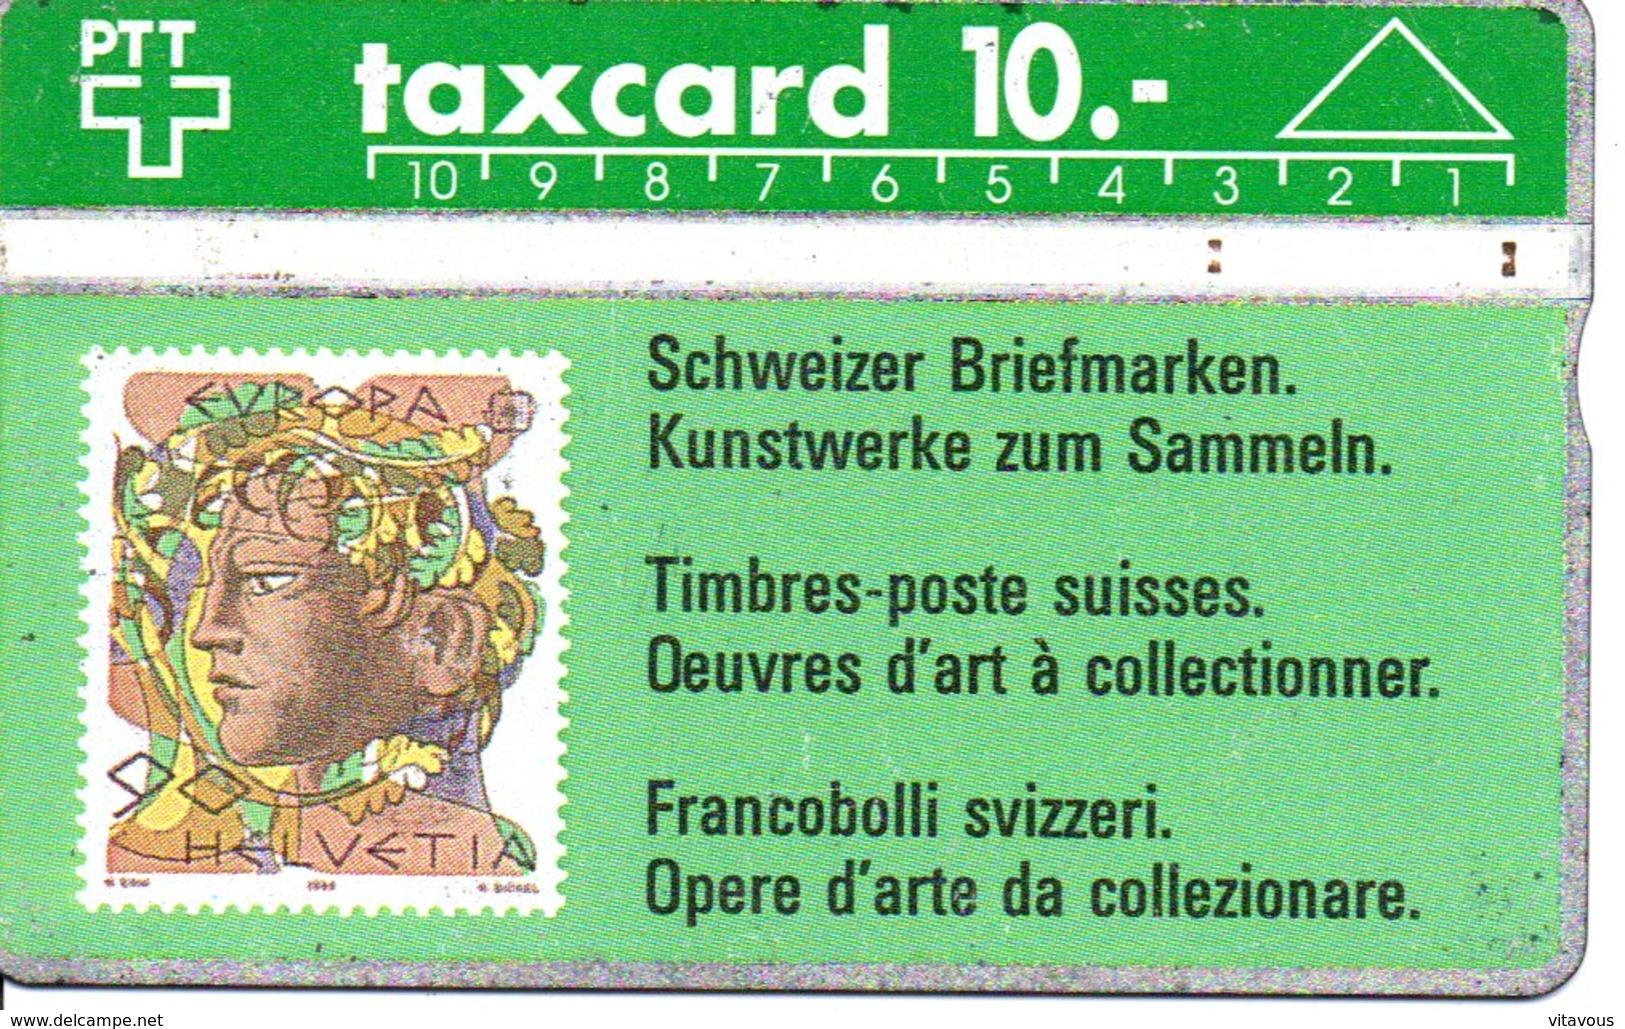 Stamp Timbre Oeuves D'art Télécarte Suisse Taxcard Phonecard  (G 105) - Timbres & Monnaies